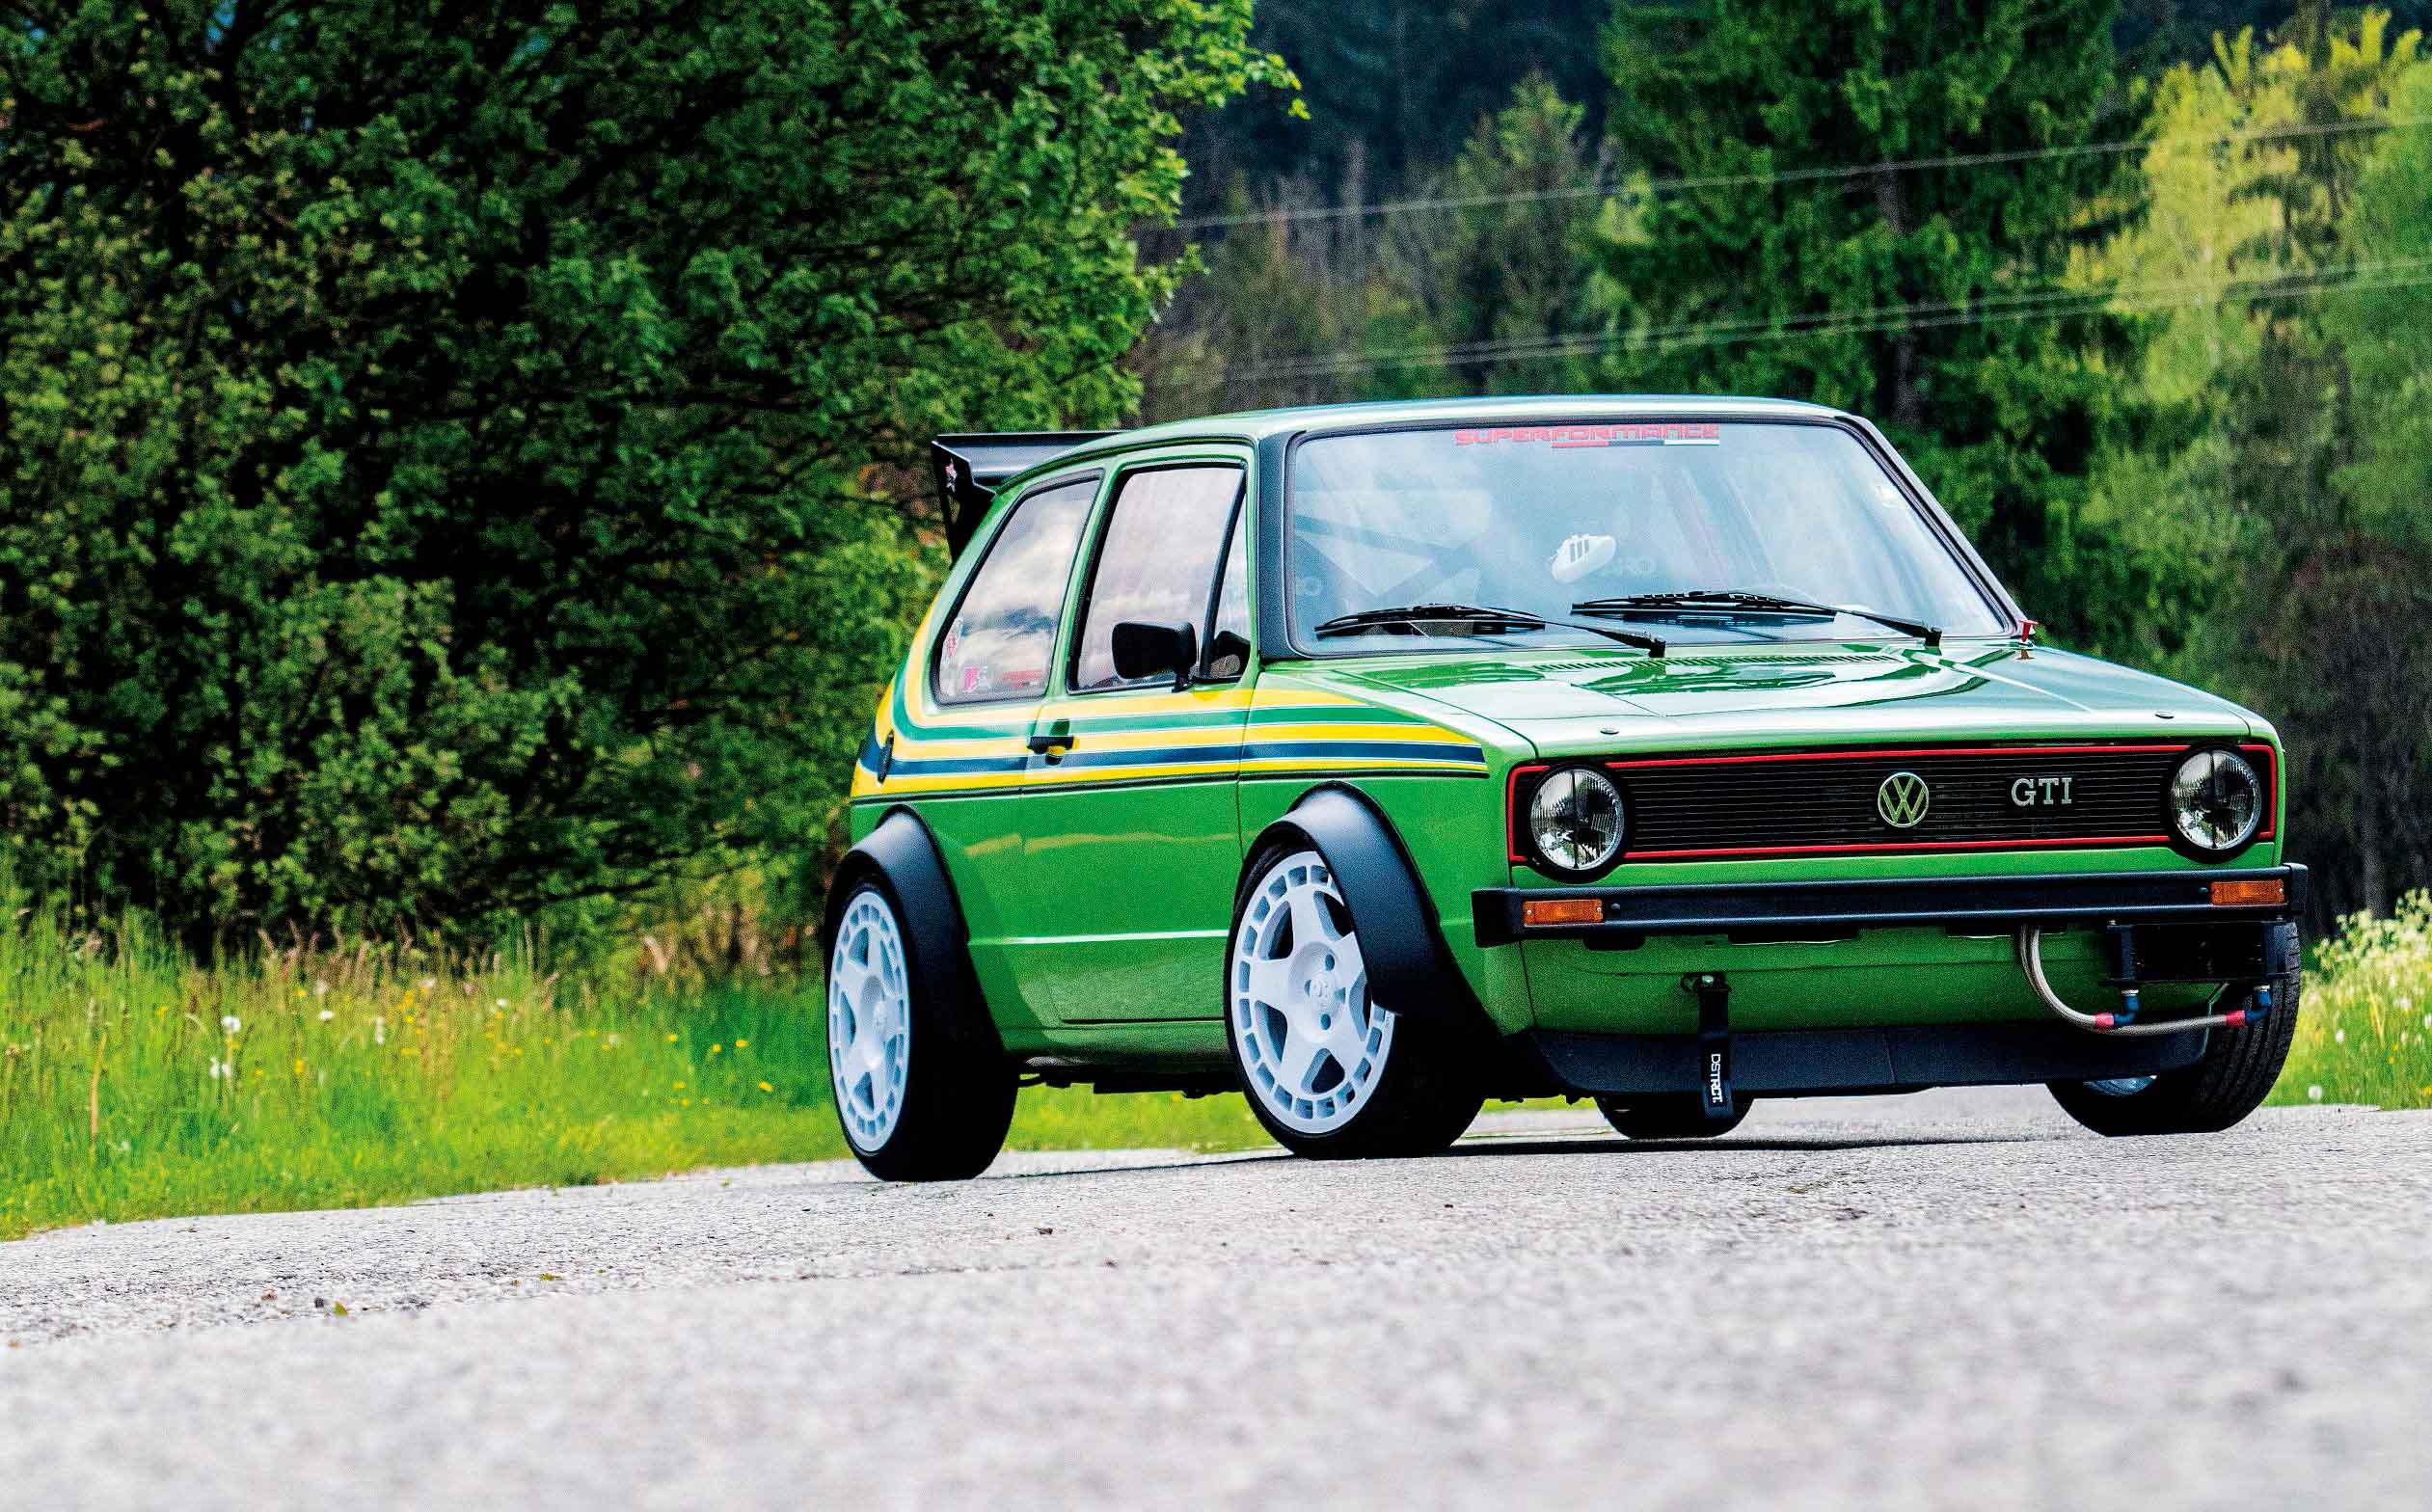 Tuned 300bhp Agu 1 8t Engined 1979 Volkswagen Golf Gti Mk1 Drive My Blogs Drive